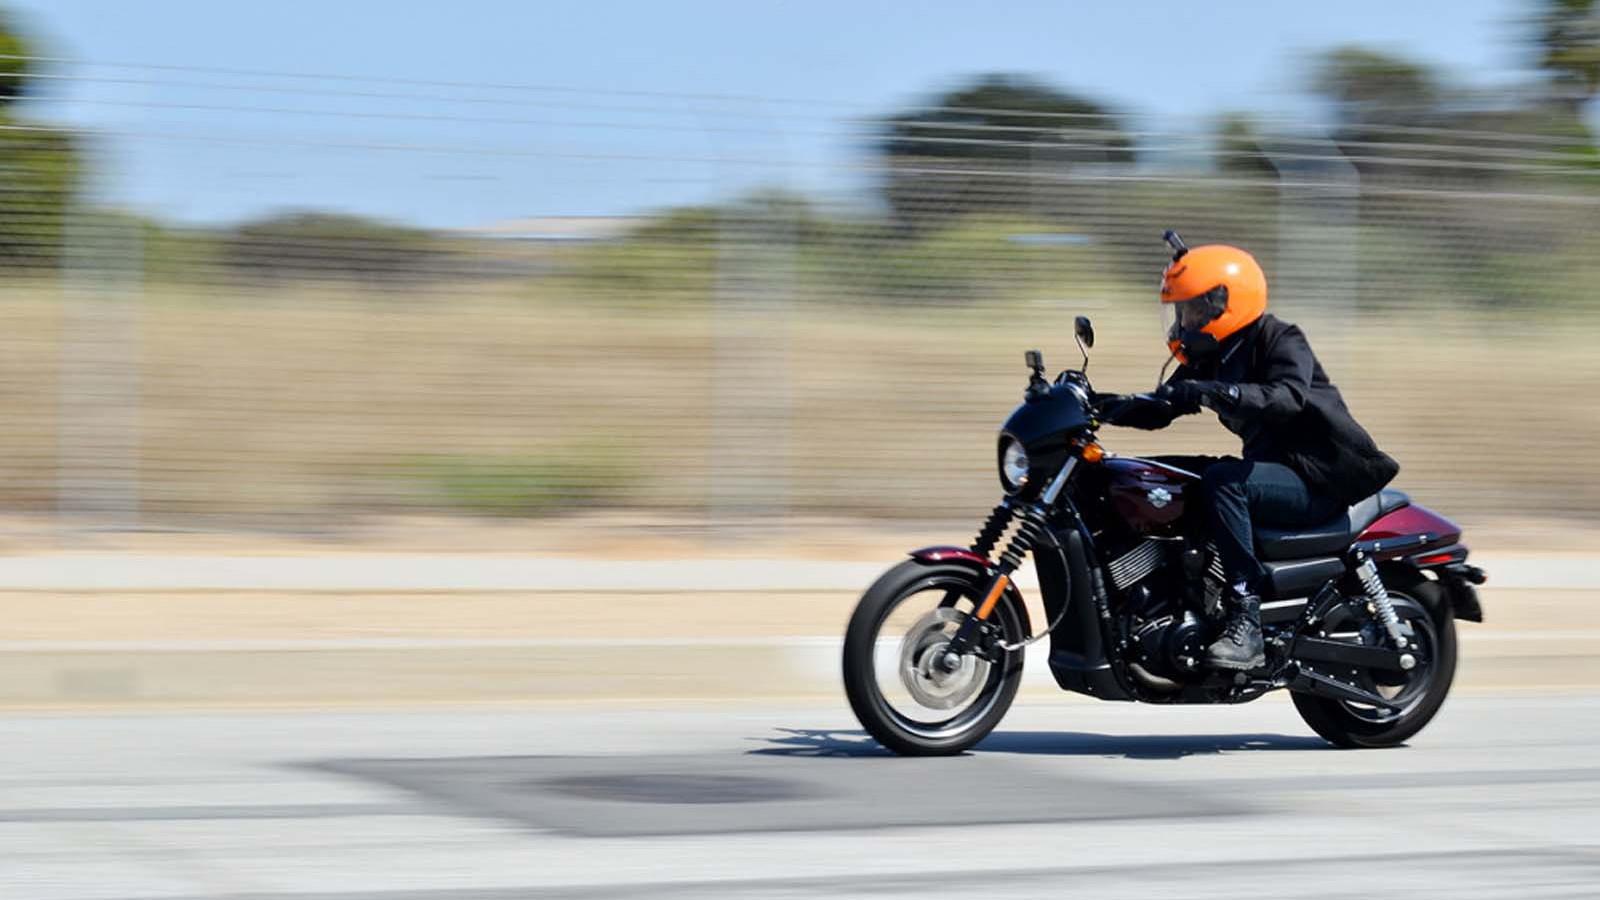 Harley-Davidson Street 750 by Joseph Yoon